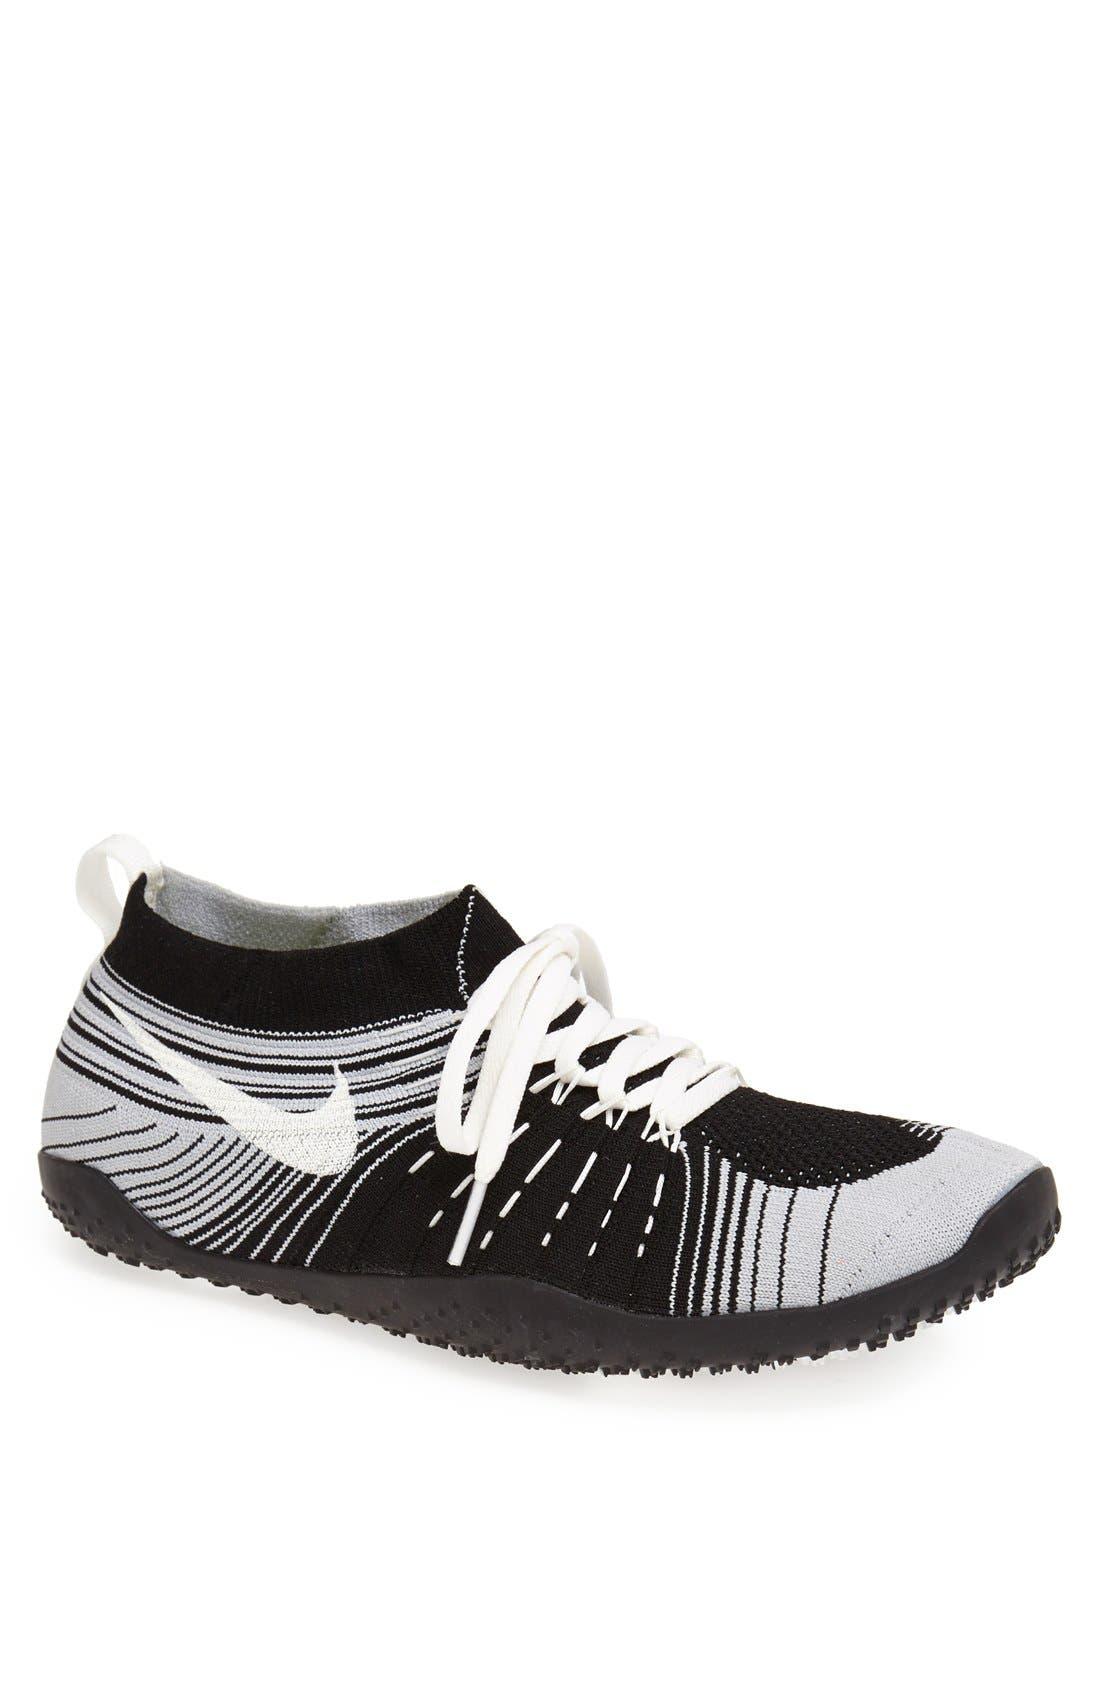 'Free Hyperfeel TR' Training Shoe, Main, color, 001